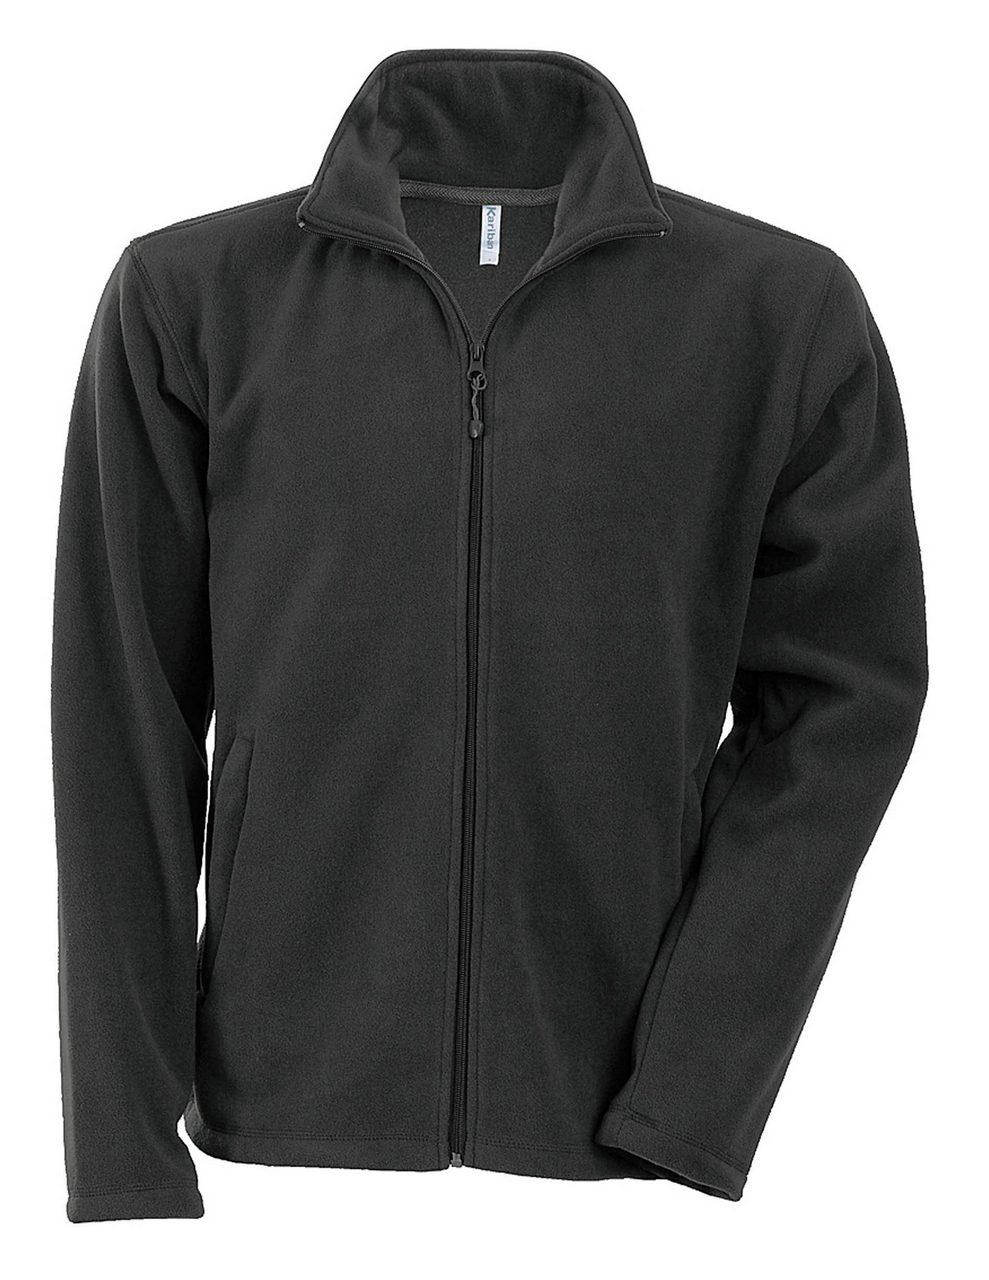 Fleece KA911 gri inchis veste jachete dama barbatesti polar fleece softshell fas gluga ploaie vant broderie serigrafie termotransfer